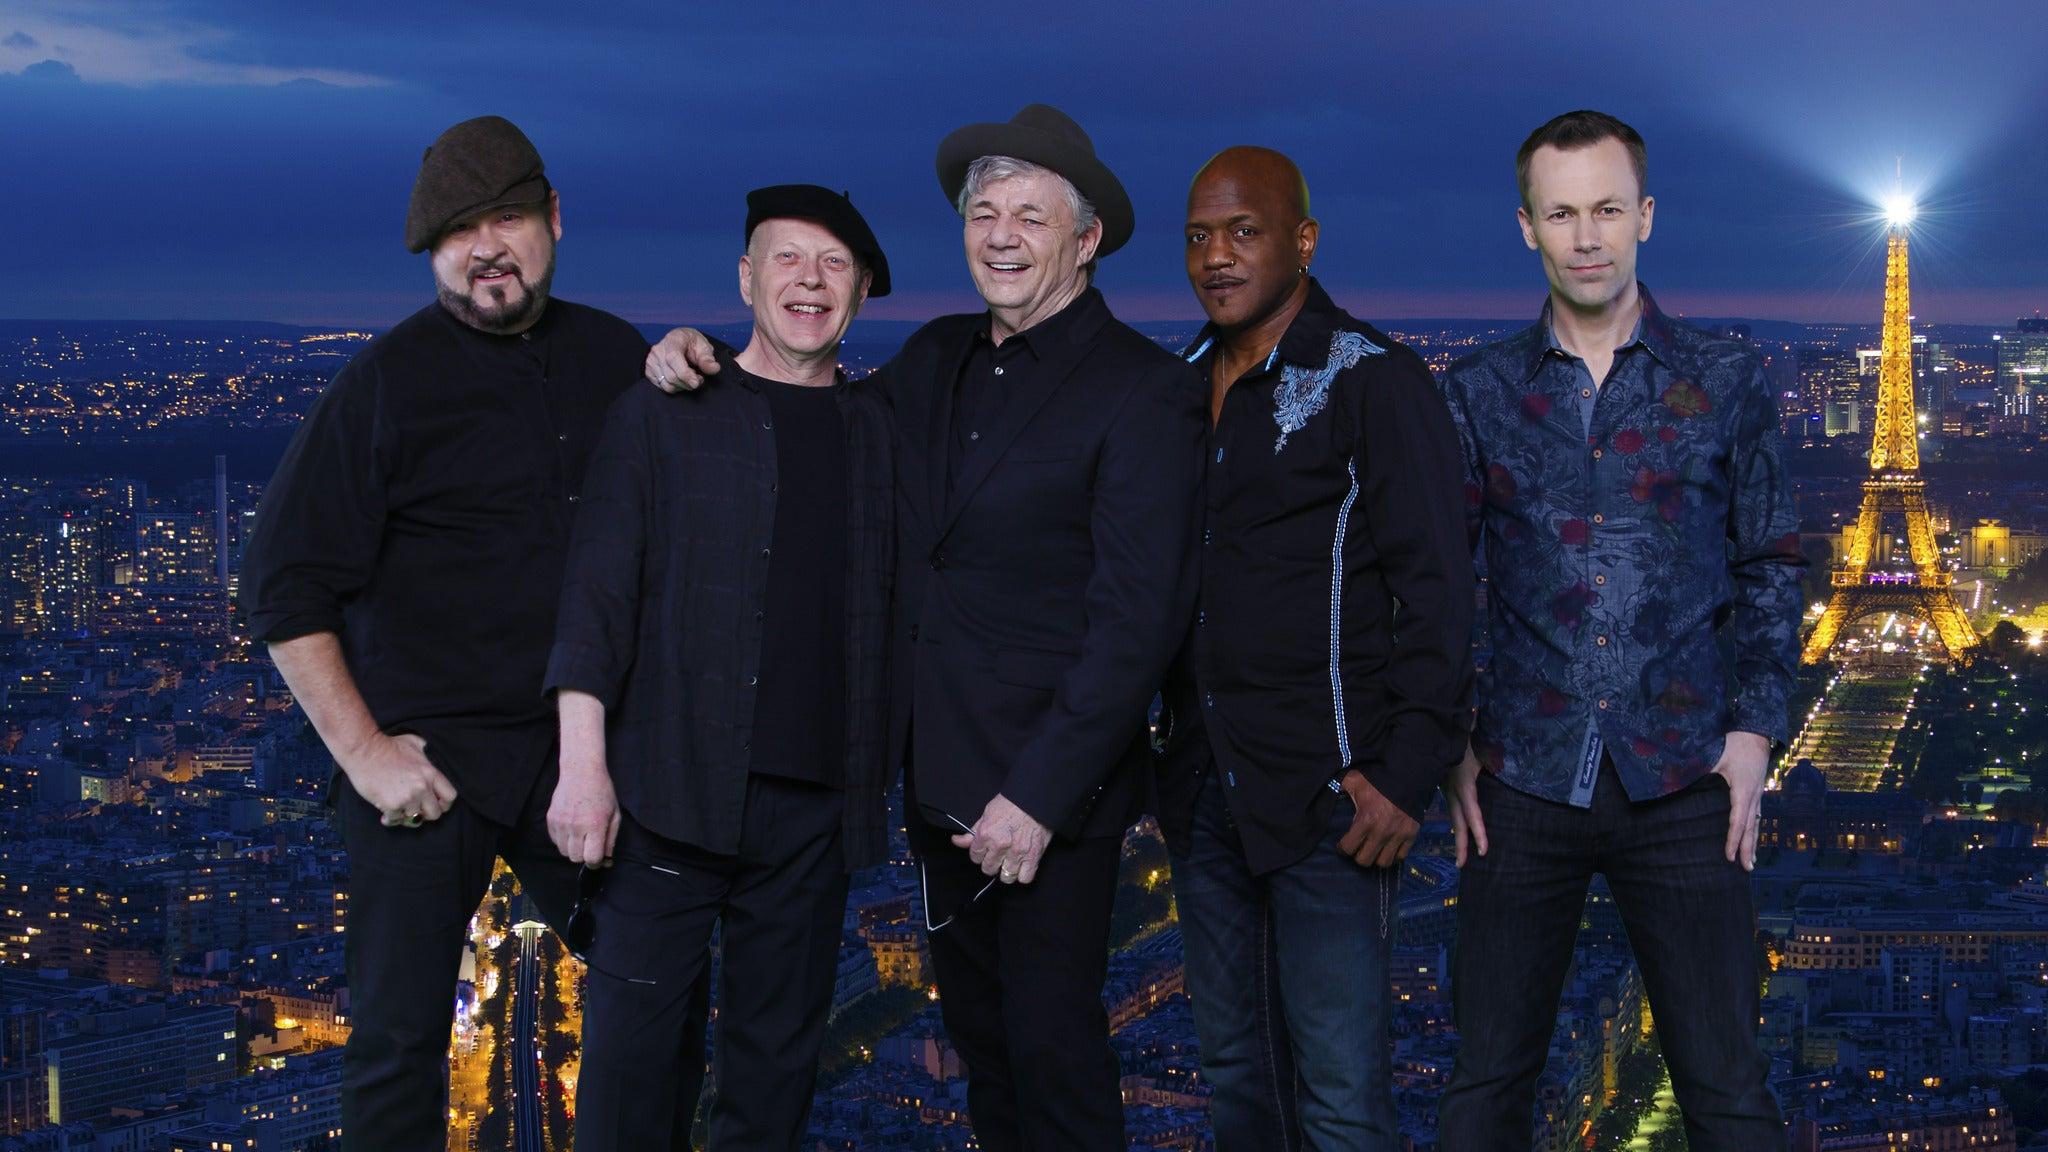 Steve Miller Band at Sandia Casino Amphitheater